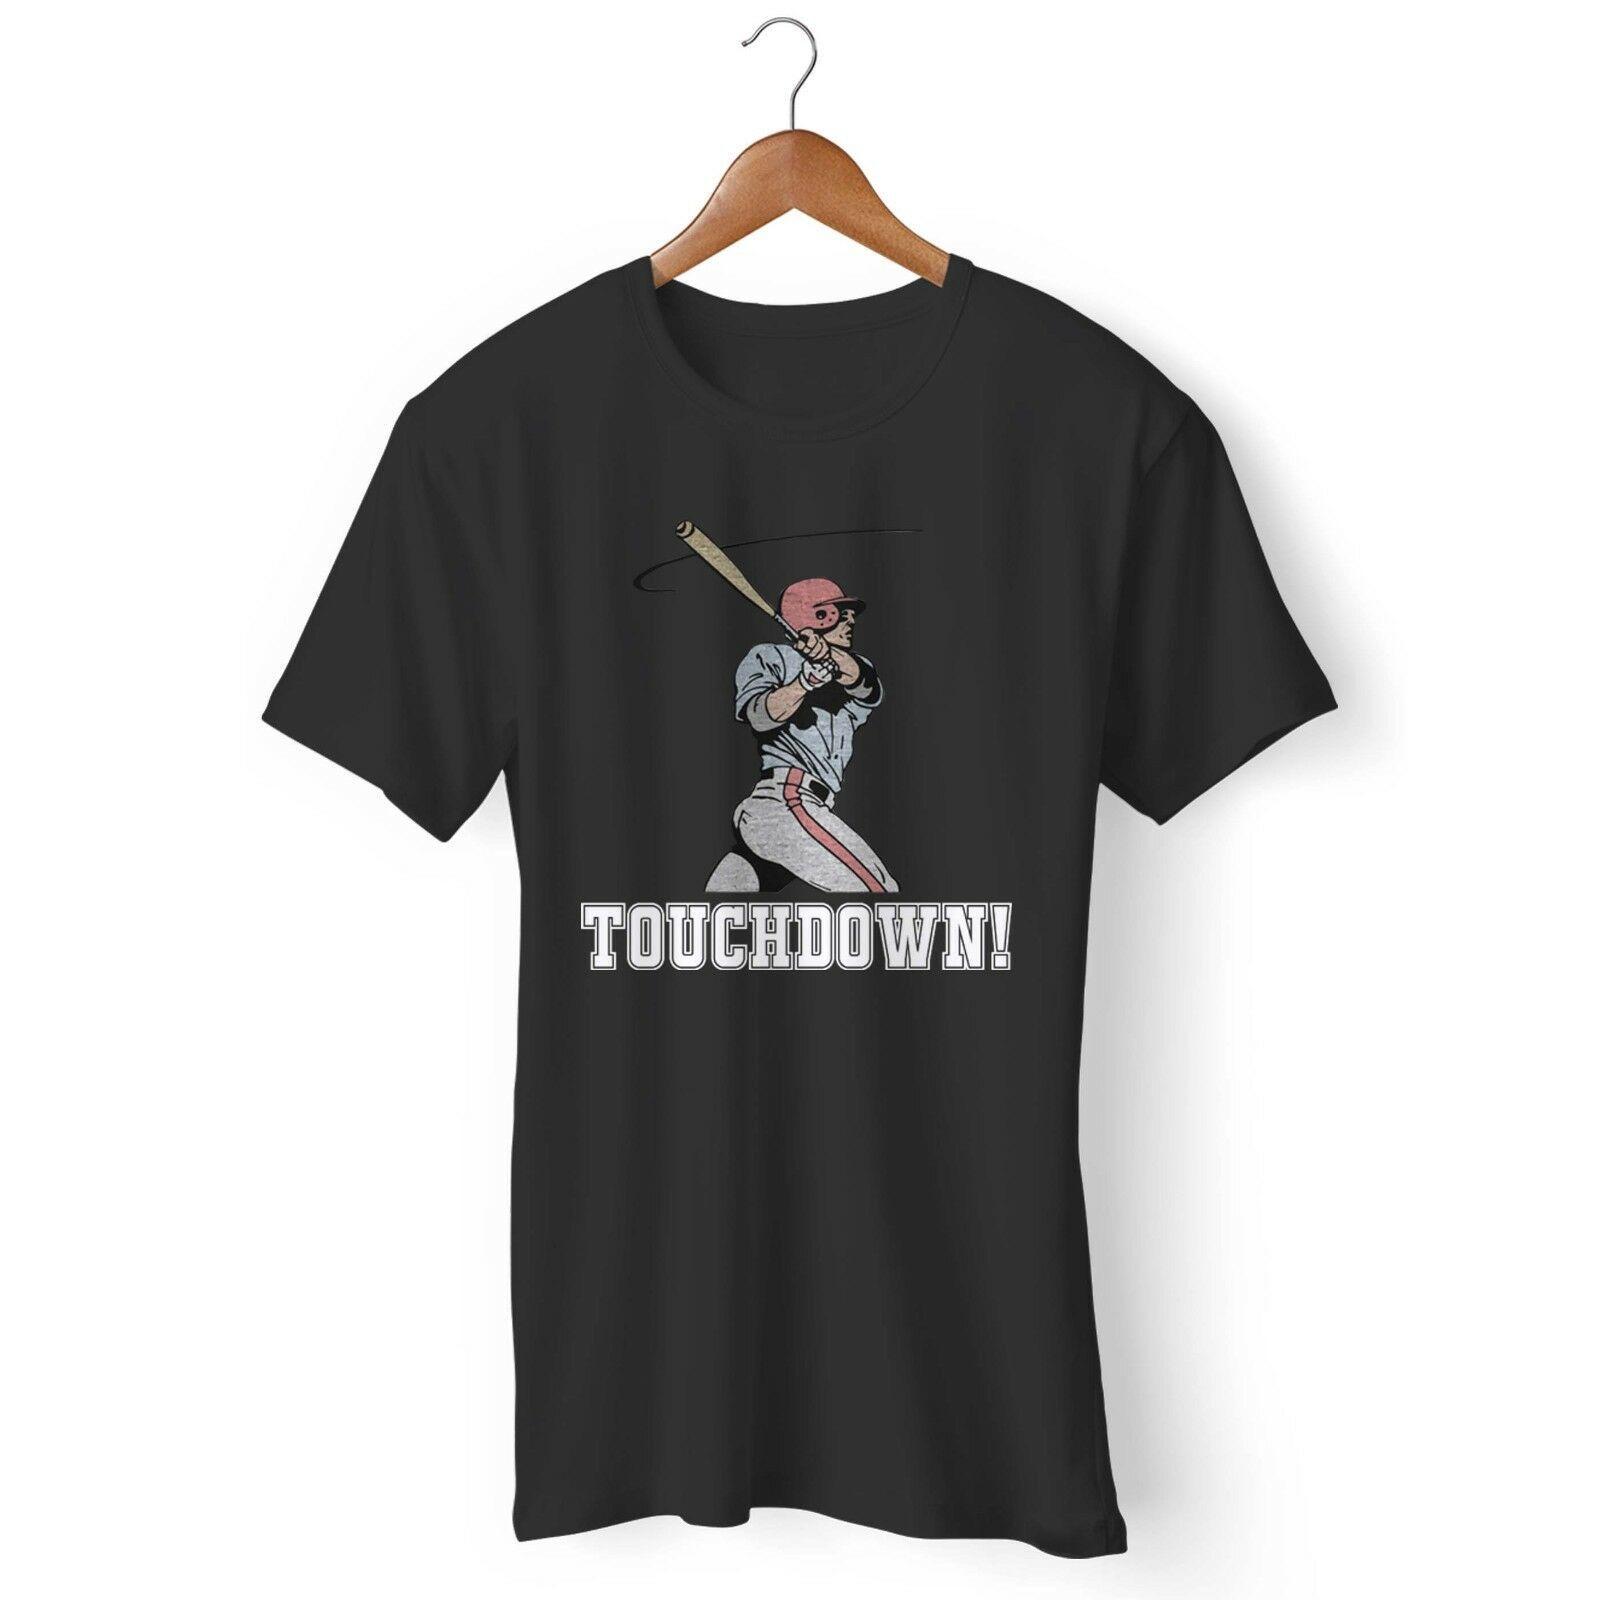 d3467831b Funny Baseball Touchdown Man's and Woman's T-Shirt Harajuku Summer 2018  Tshirt Style Round Style tshirt